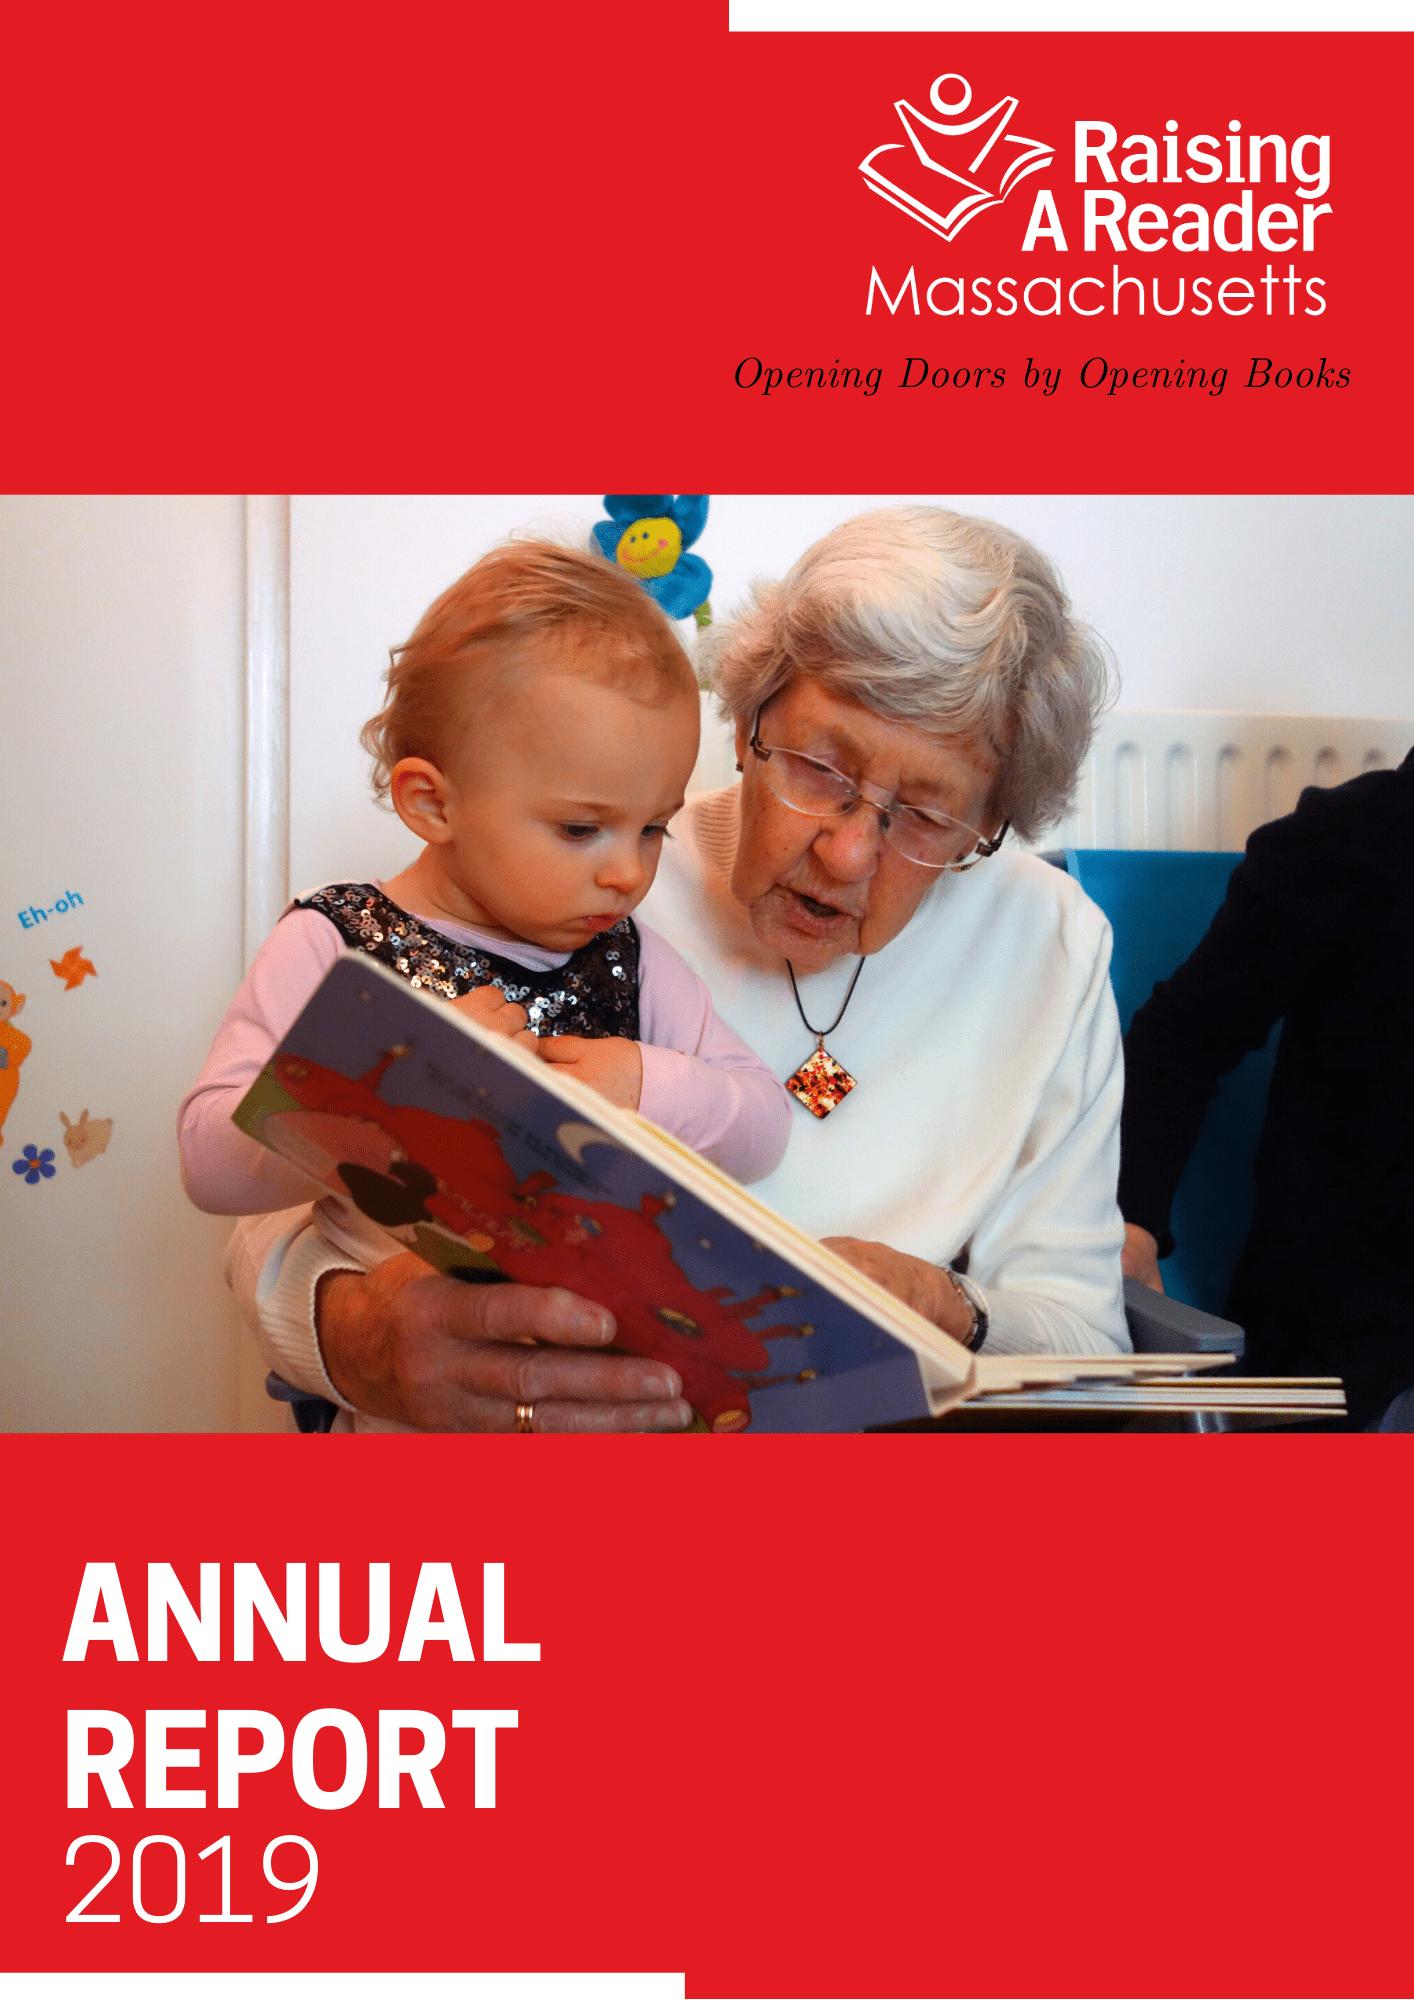 RARMA 2019 Annual Report FINAL